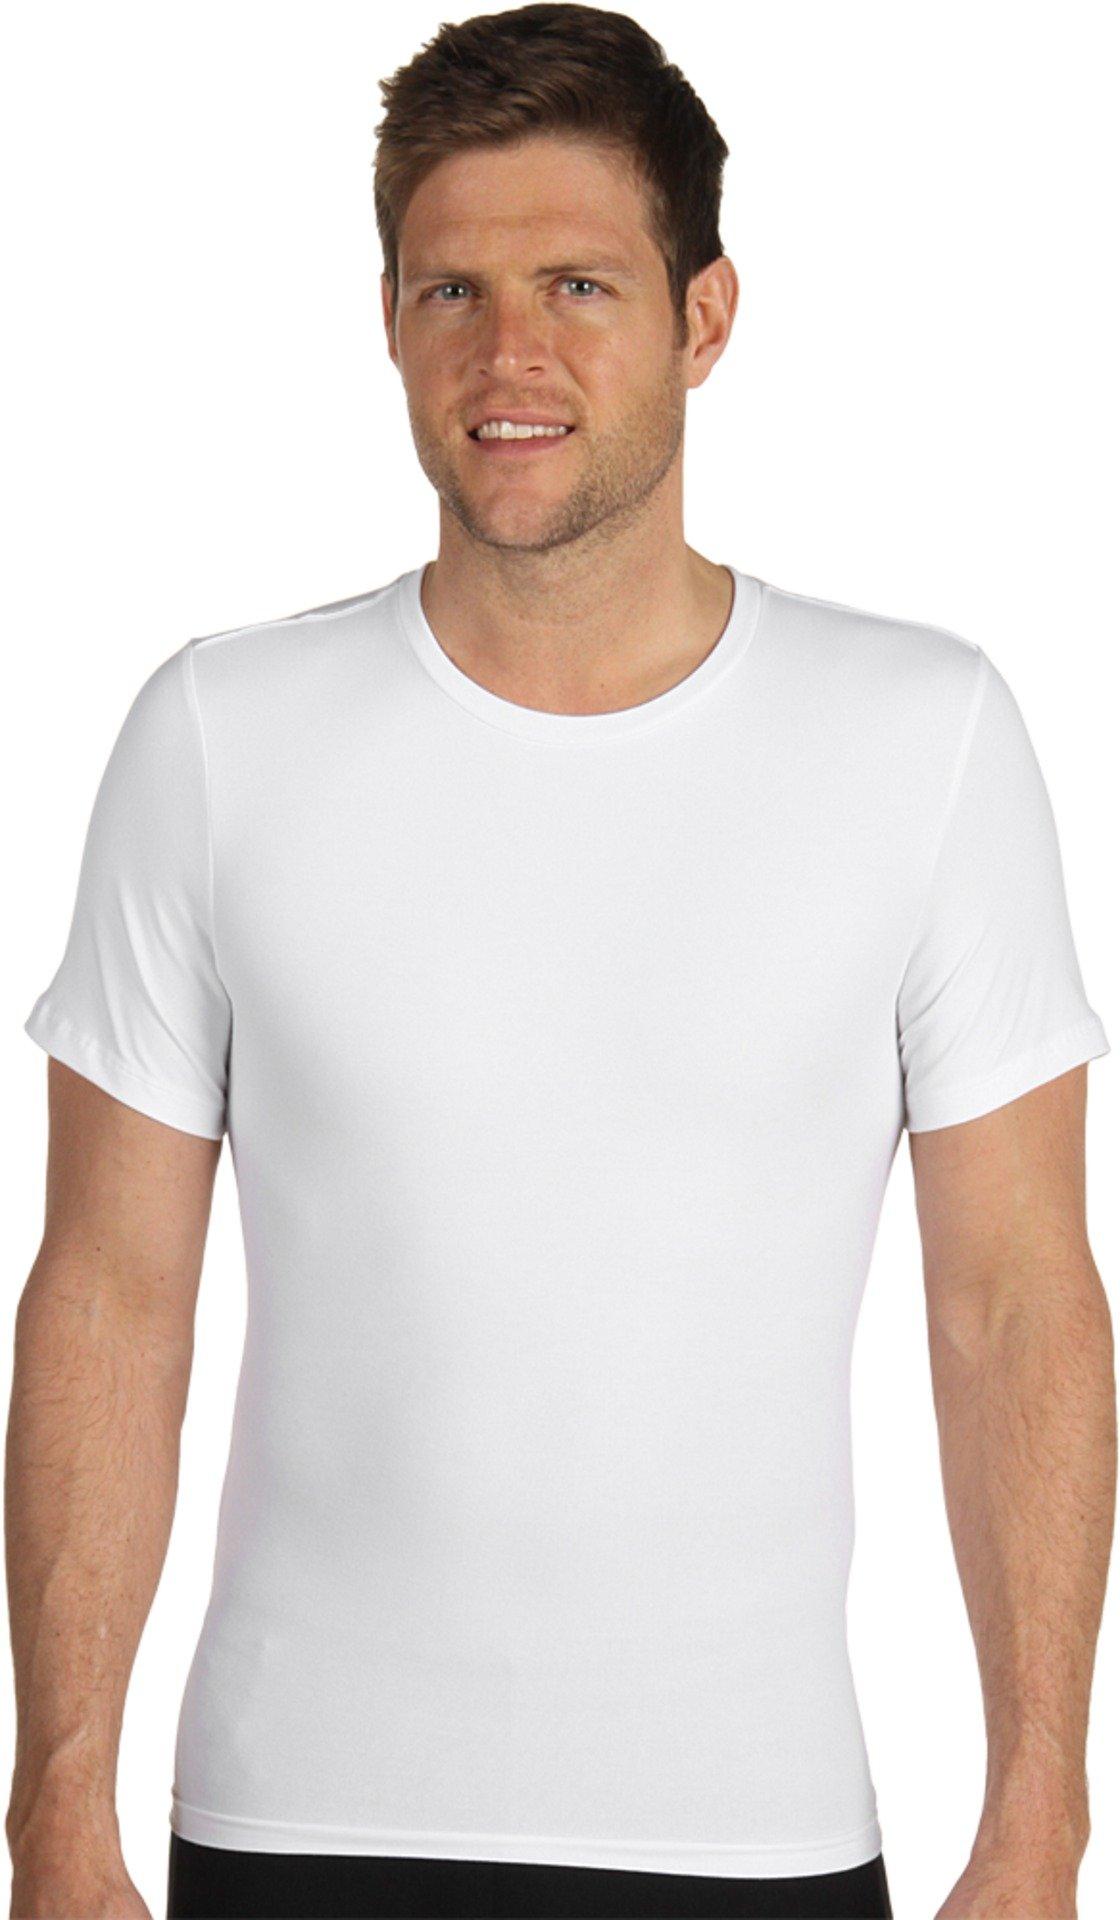 SPANX for Men Men's Cotton Compression Crew, White, LG (42-44) by SPANX